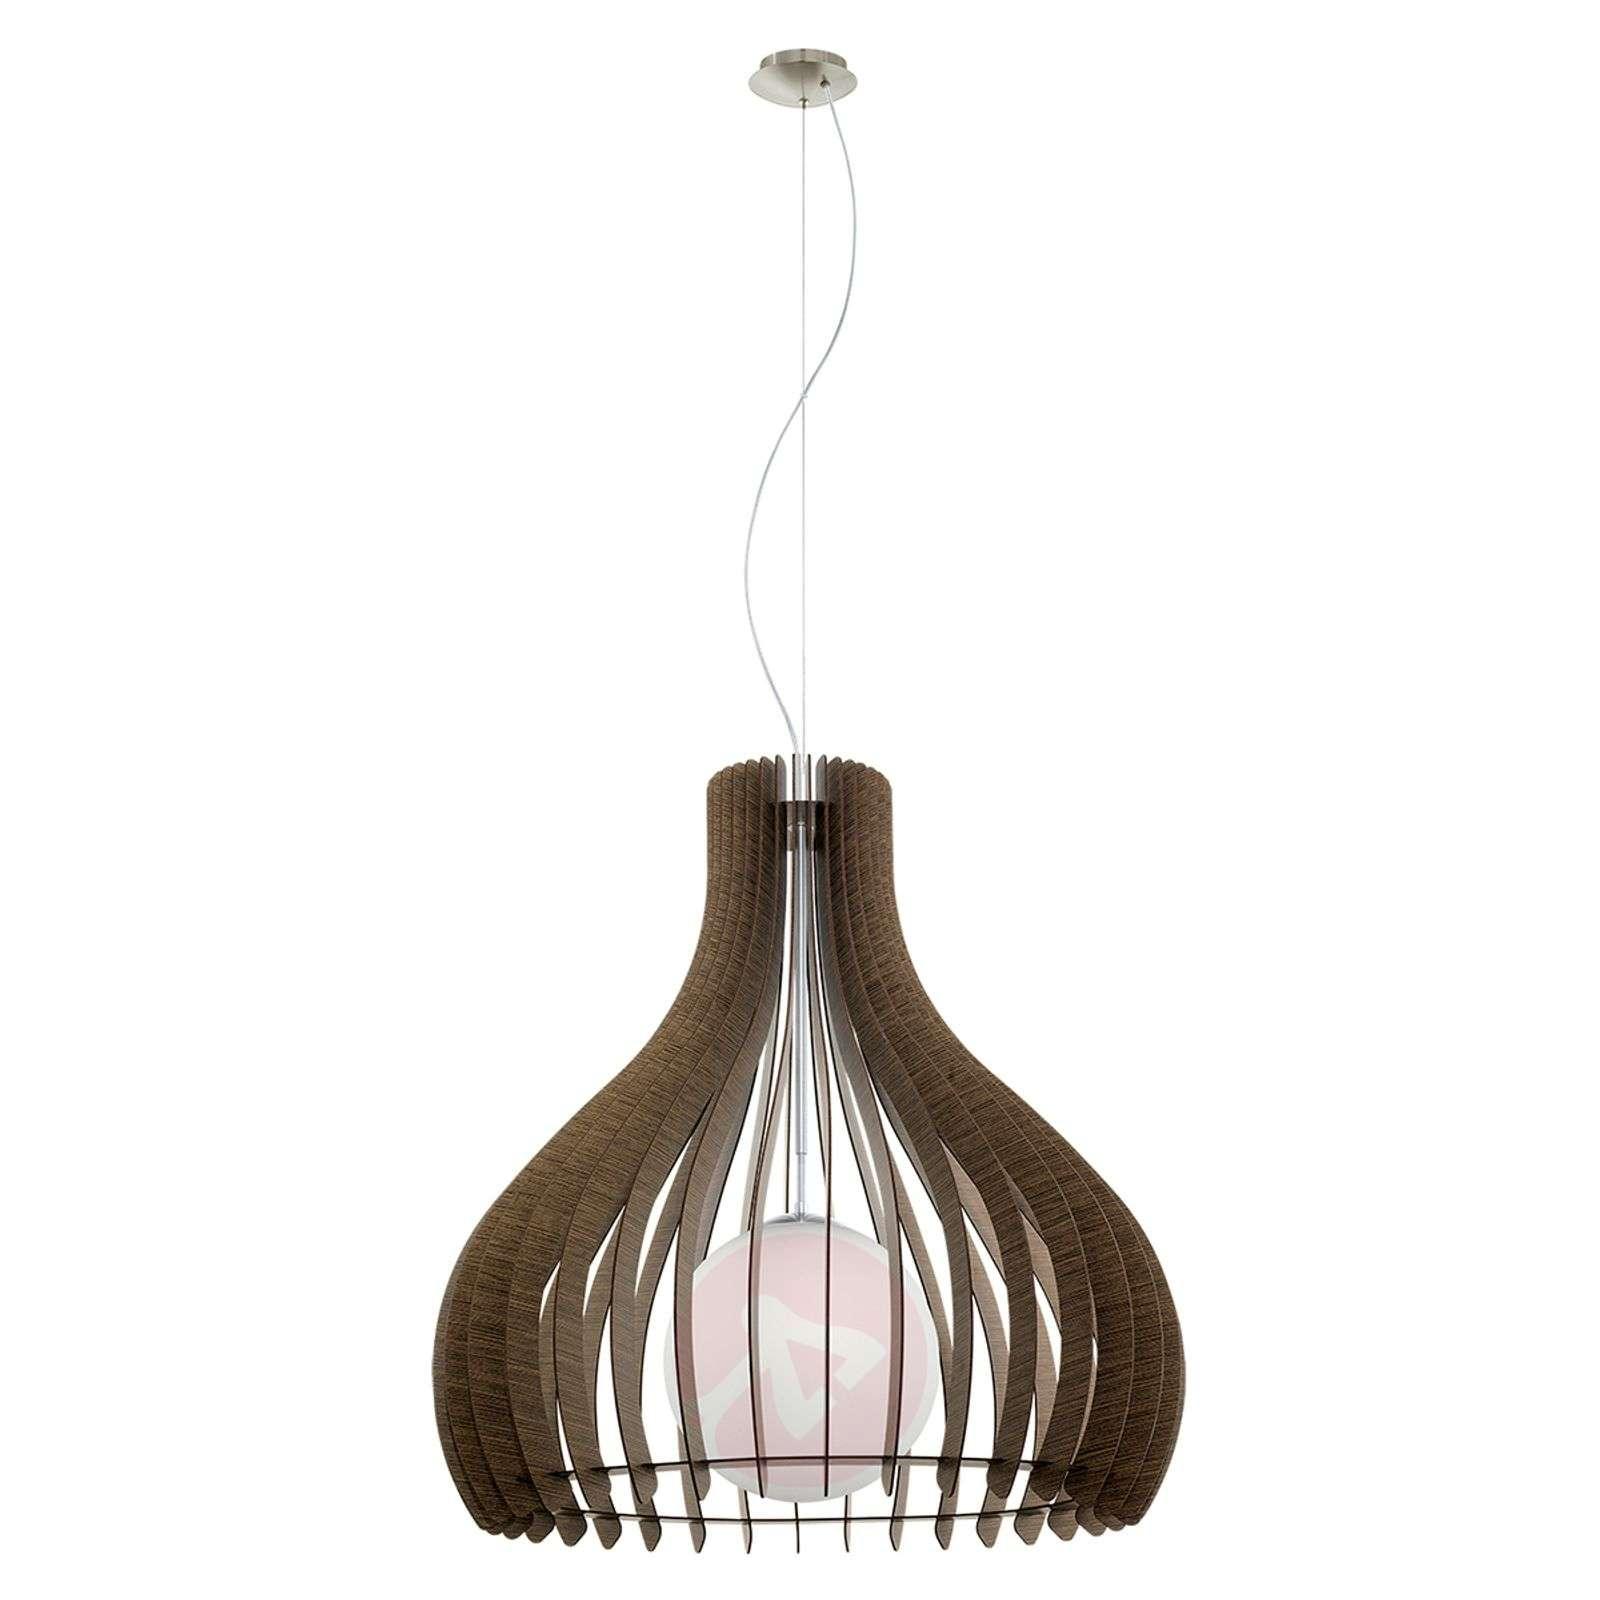 Brown Tindori hanging light with wooden slats-3031823-01